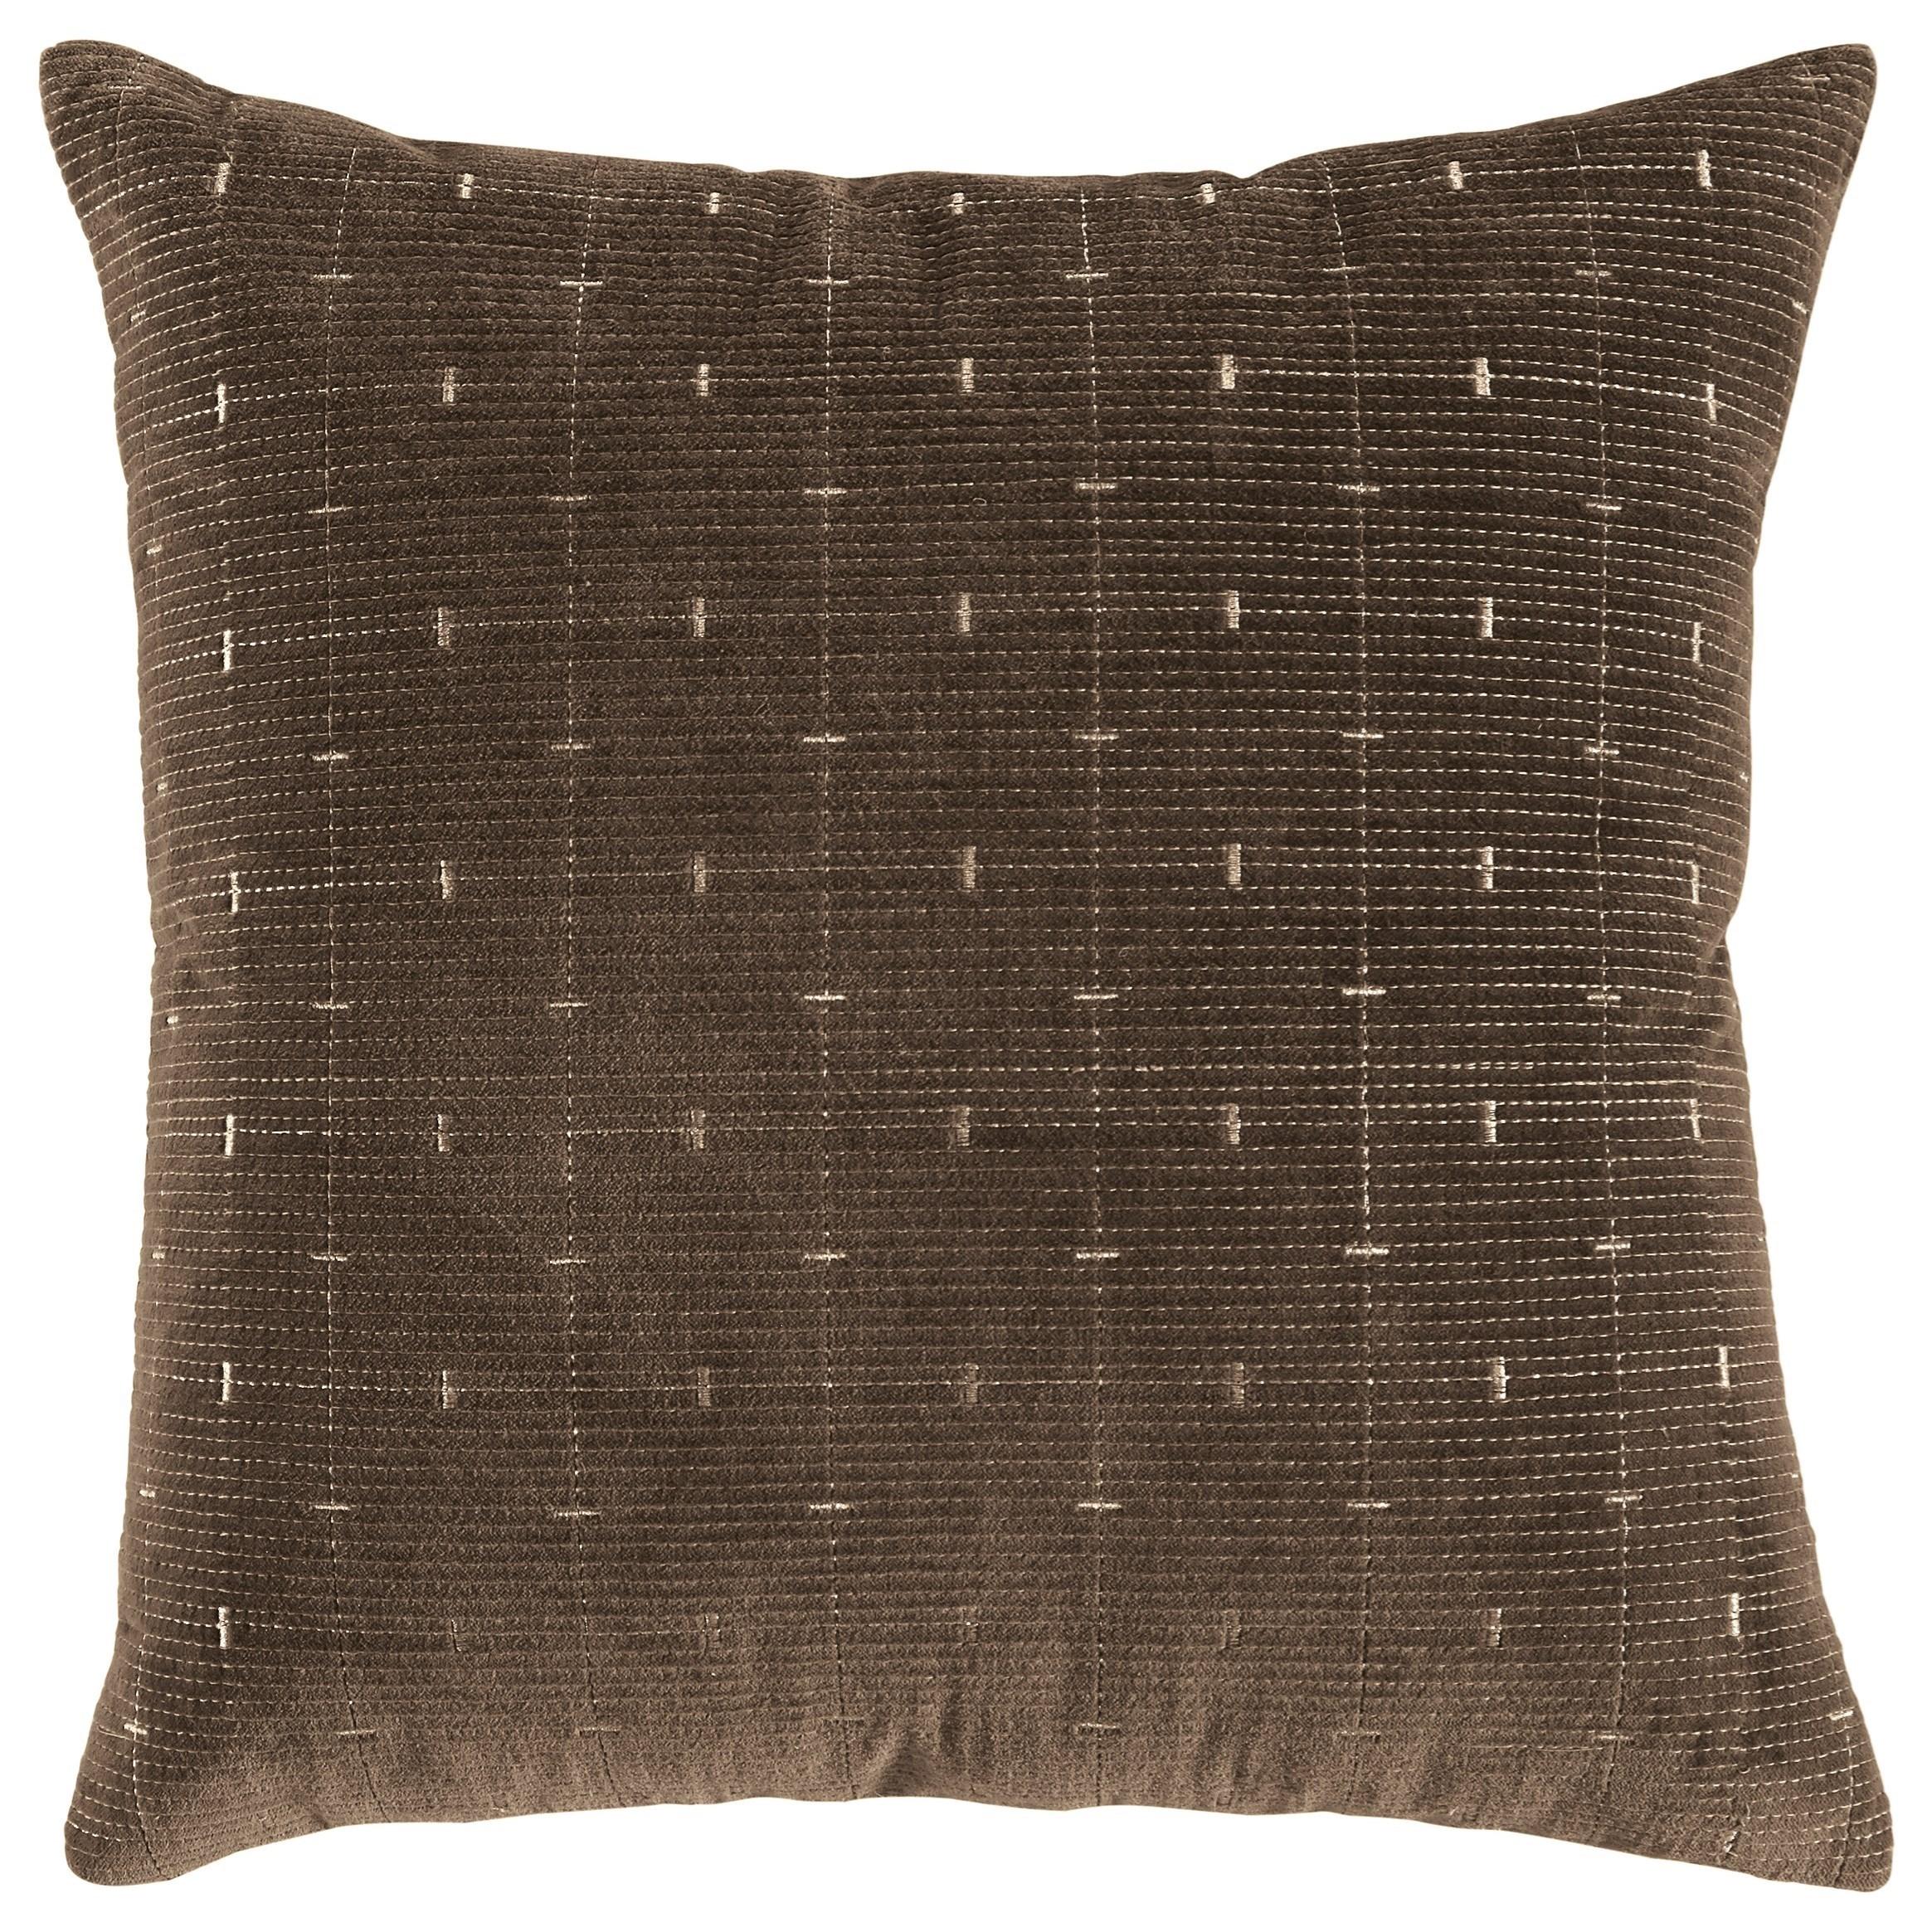 Quimby Brown Pillow